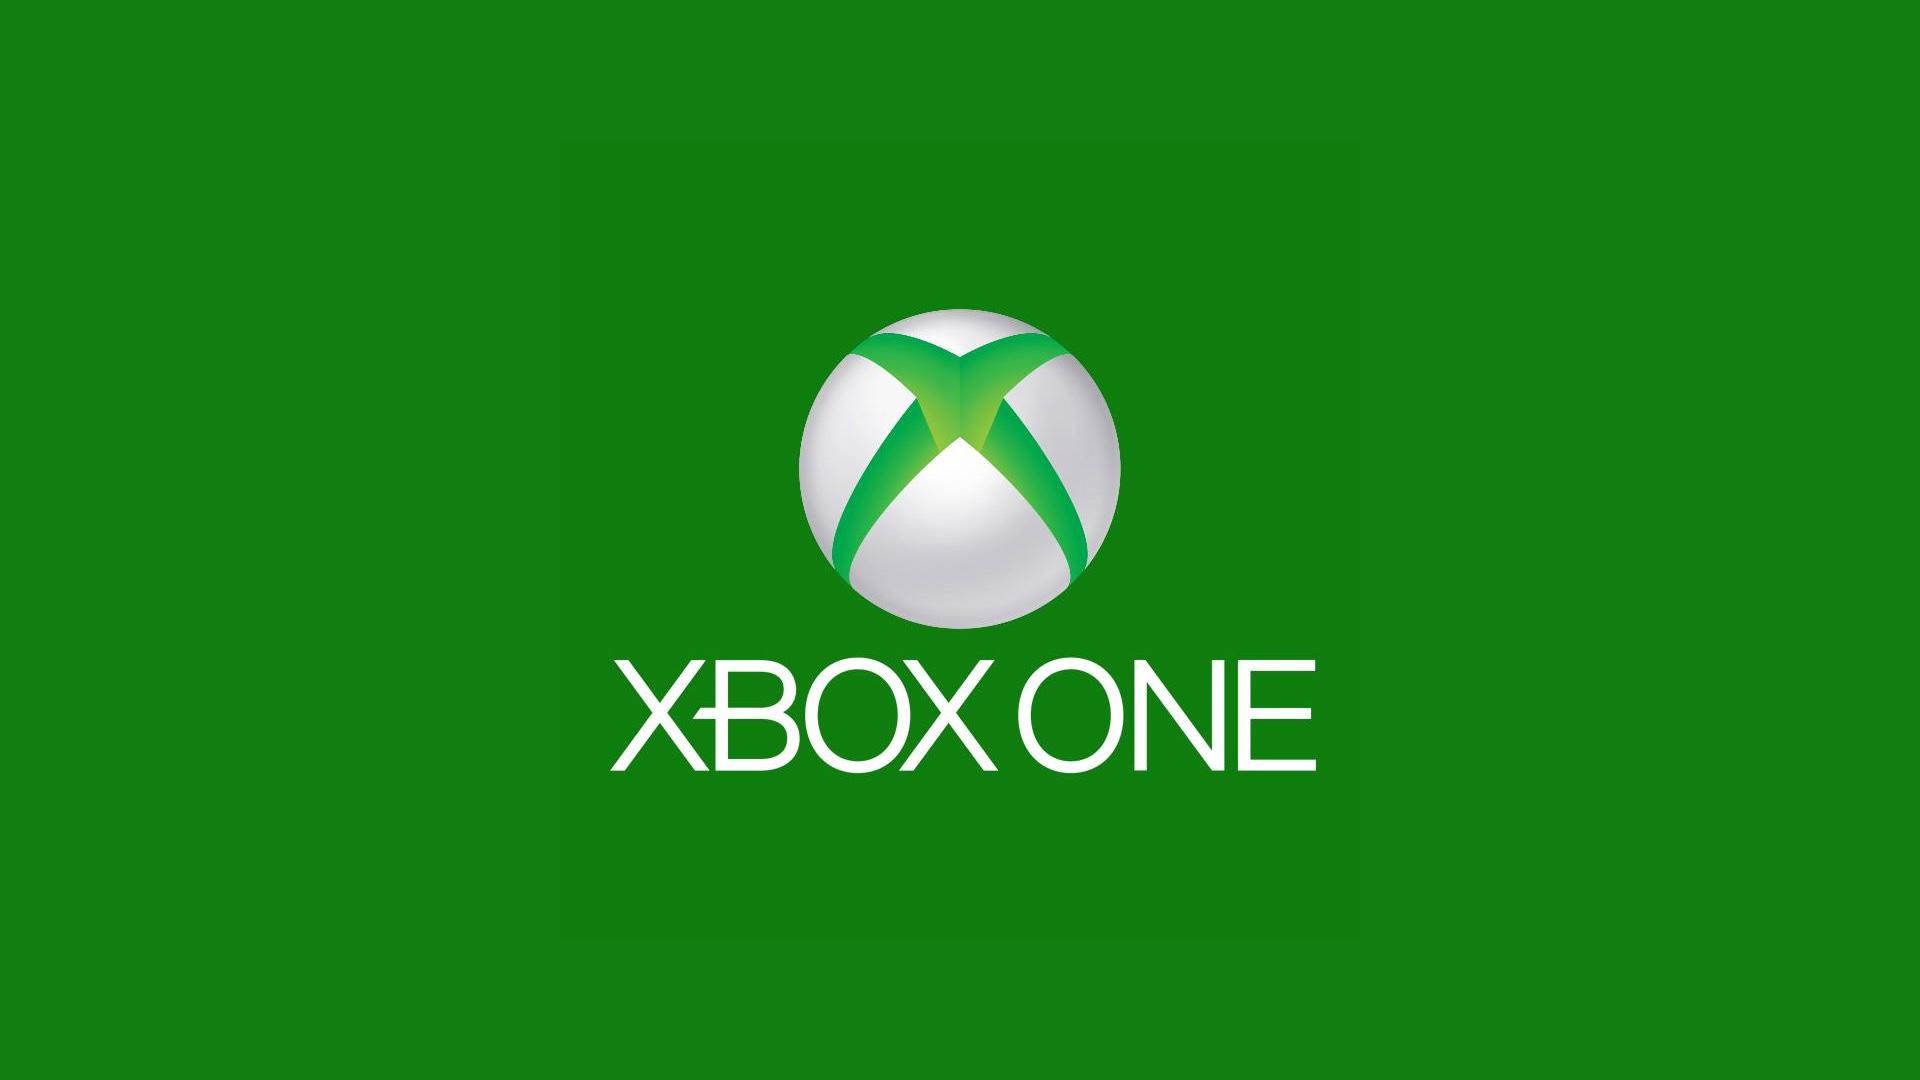 http://www.recantododragao.com.br/wp-content/uploads/2015/06/xbox-one-logo.jpg